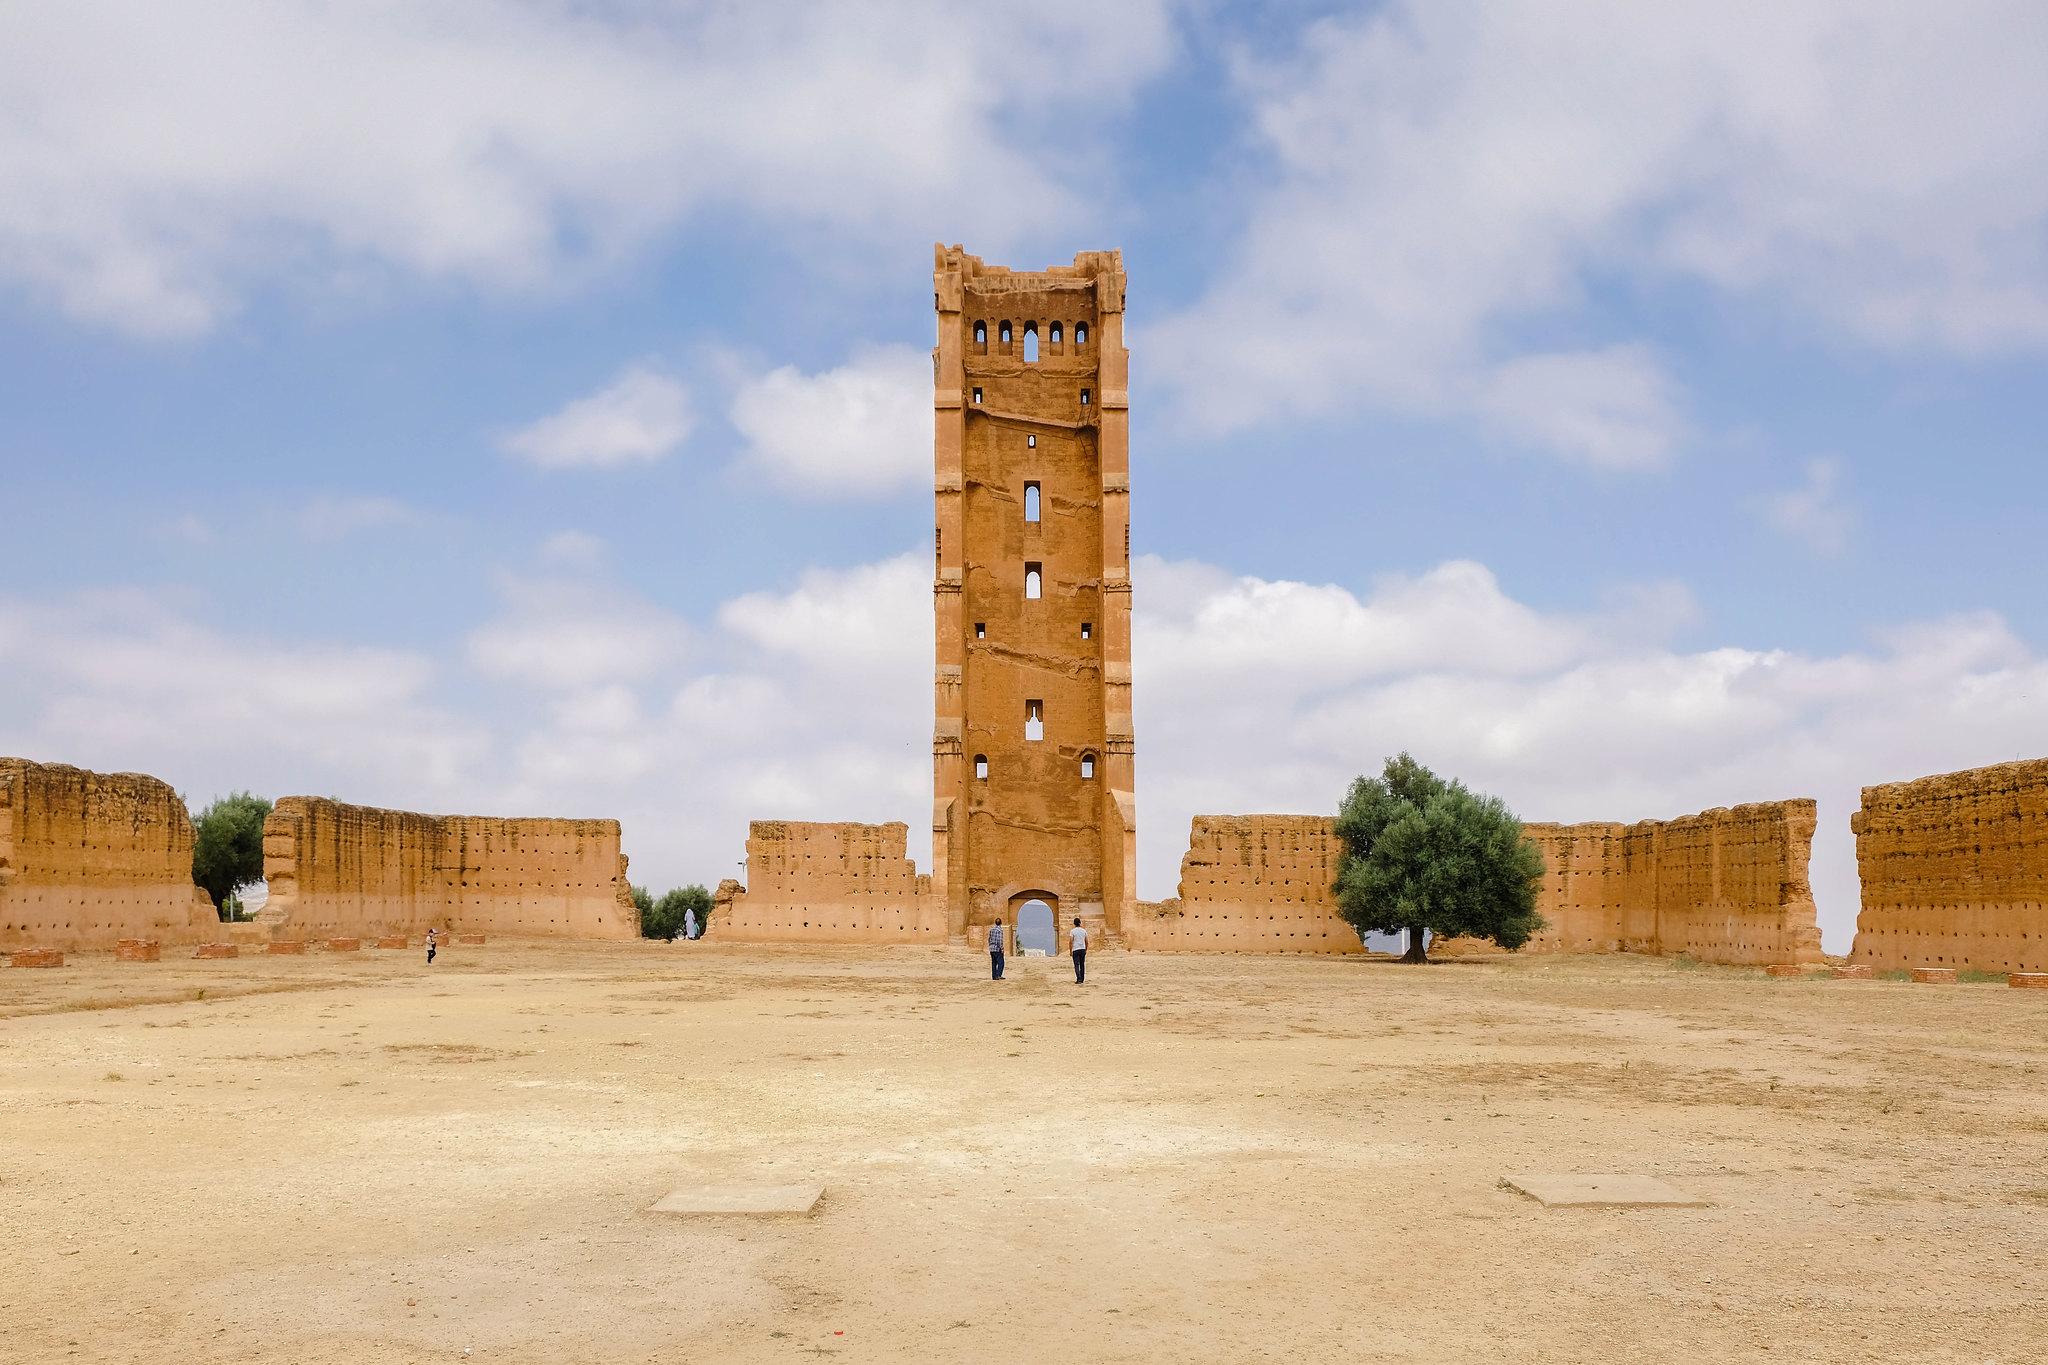 The famous Mansura minaret